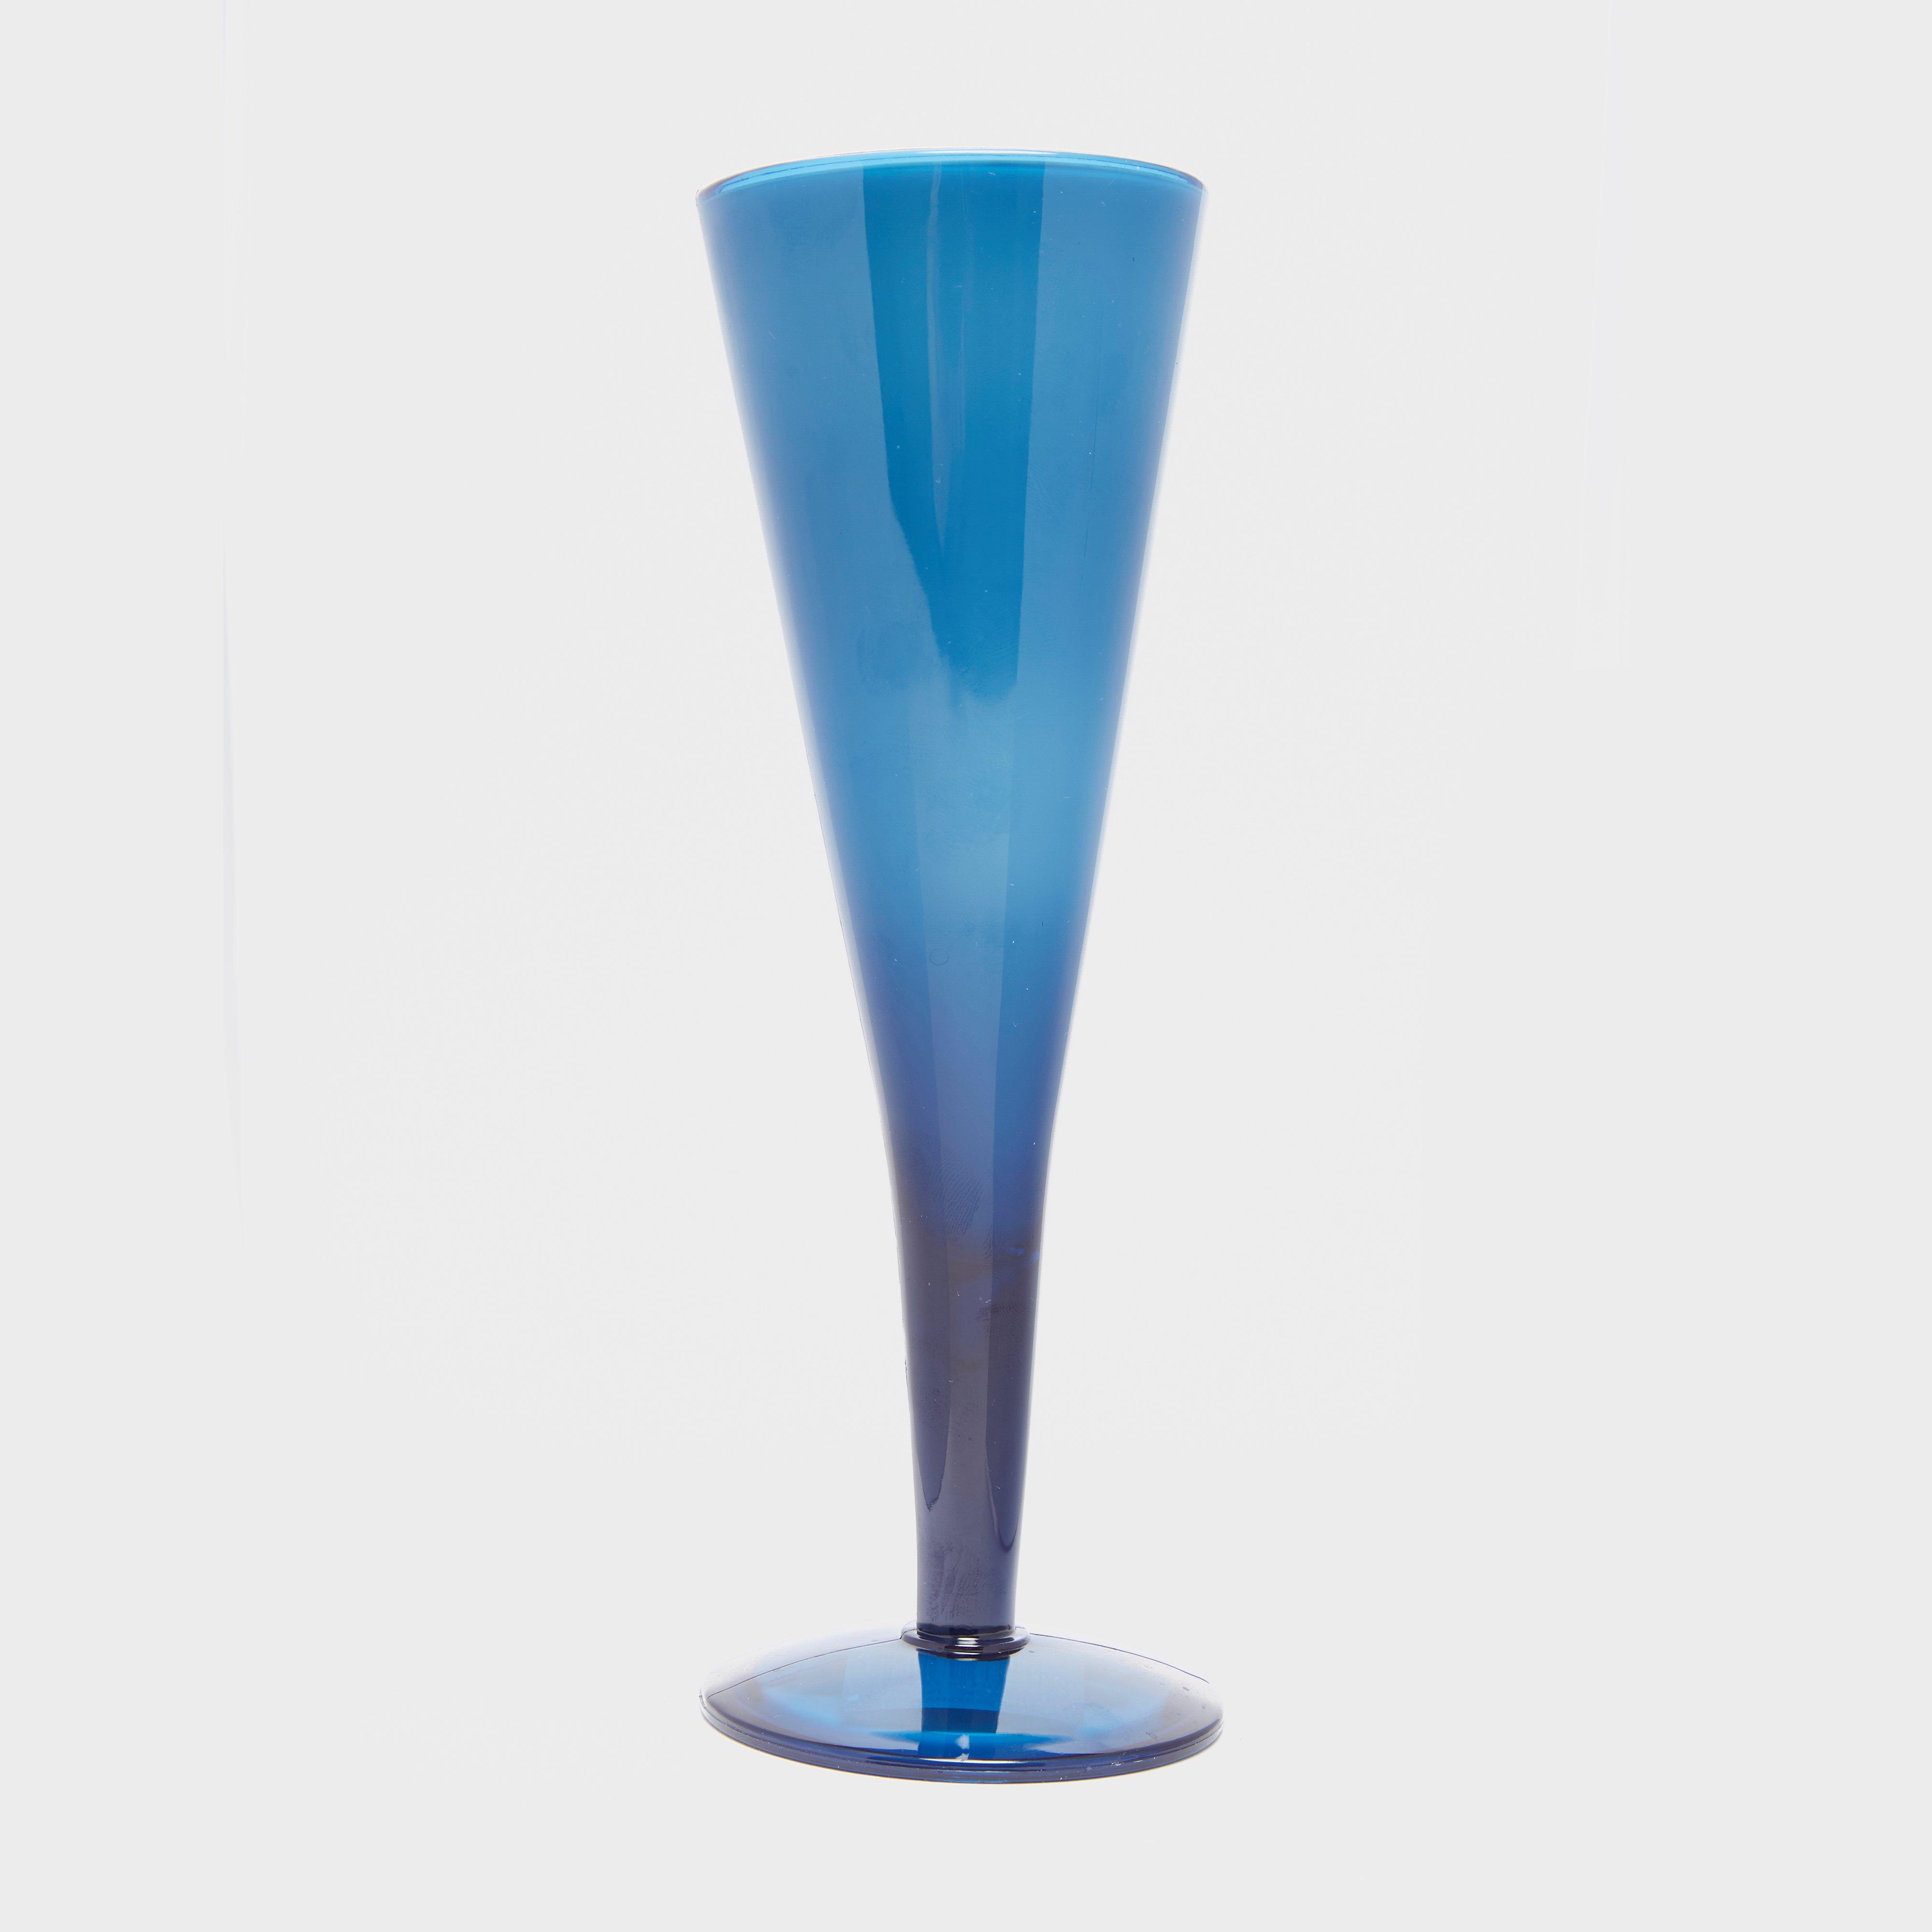 HI-GEAR Deluxe Plastic Champagne Flute, Blue/BBL